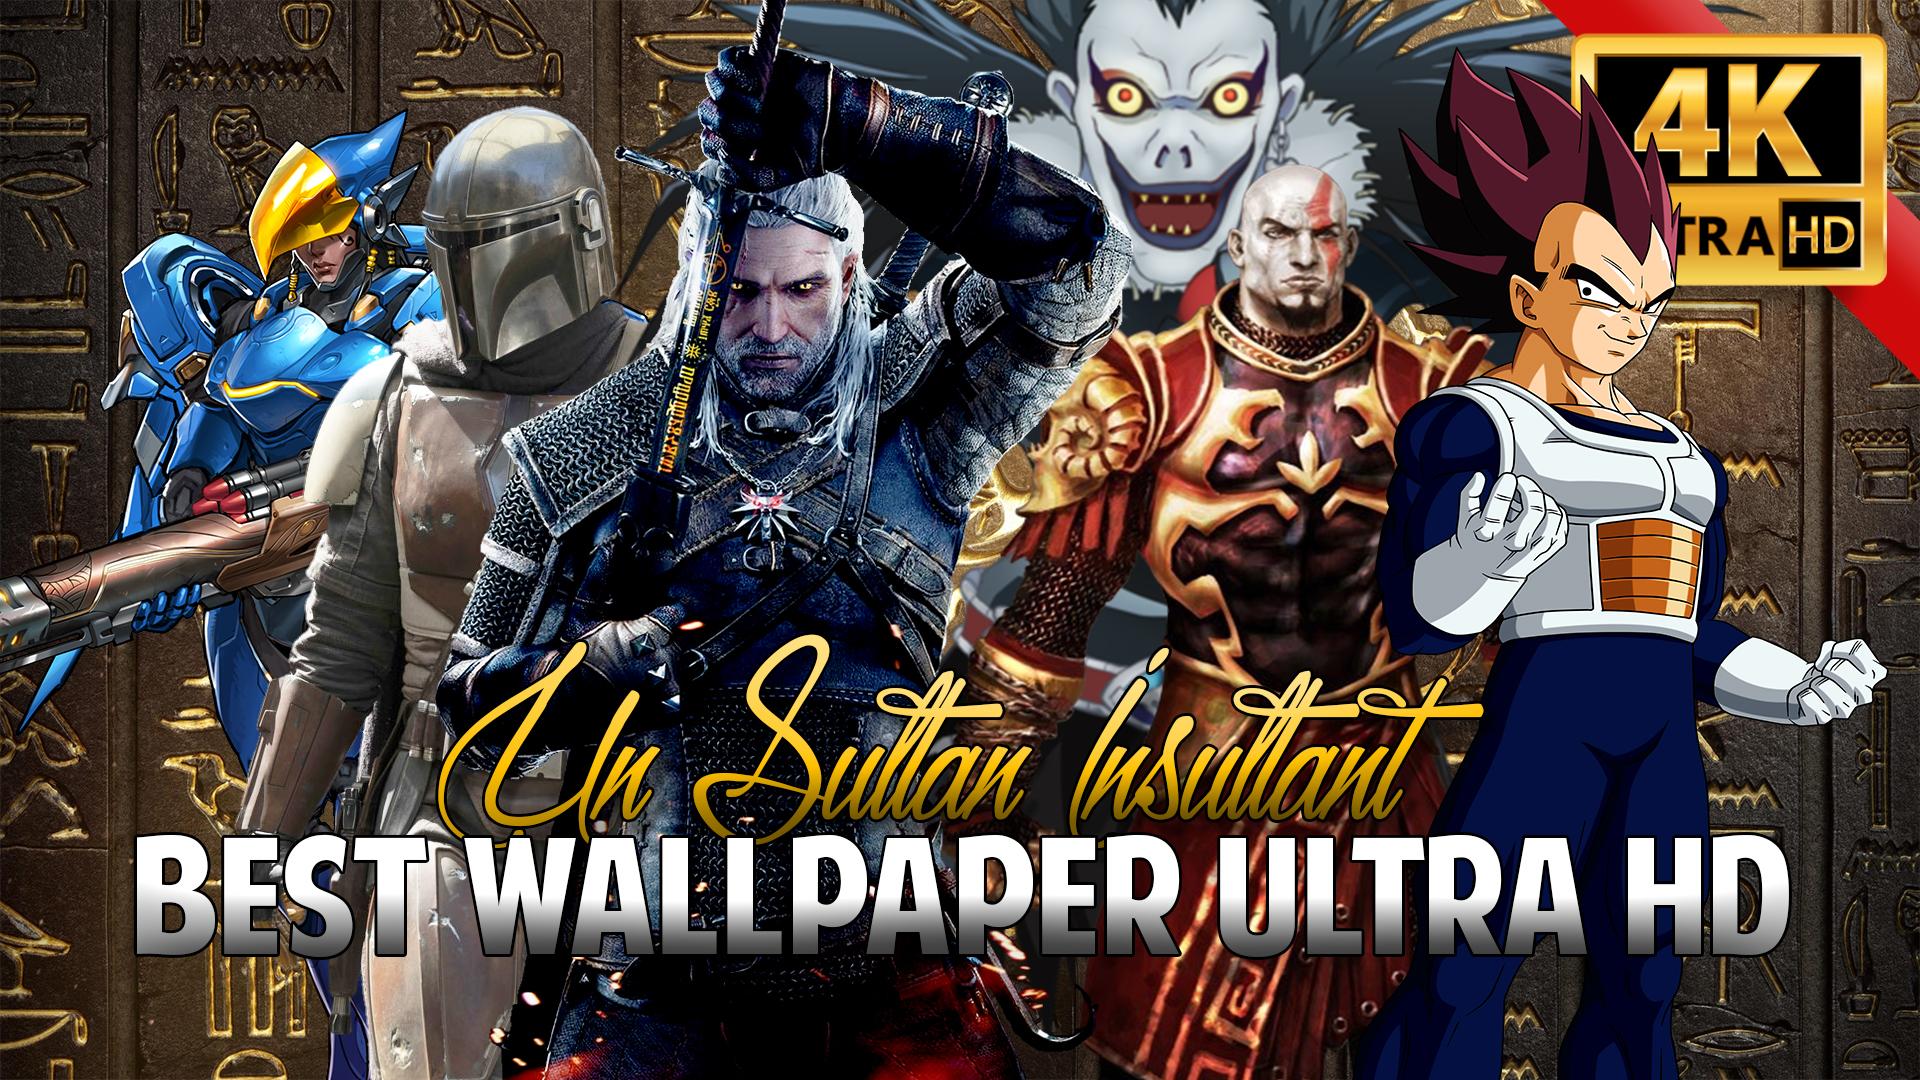 Download 8300 Koleksi Wallpaper Hitam Legam Hd HD Paling Keren